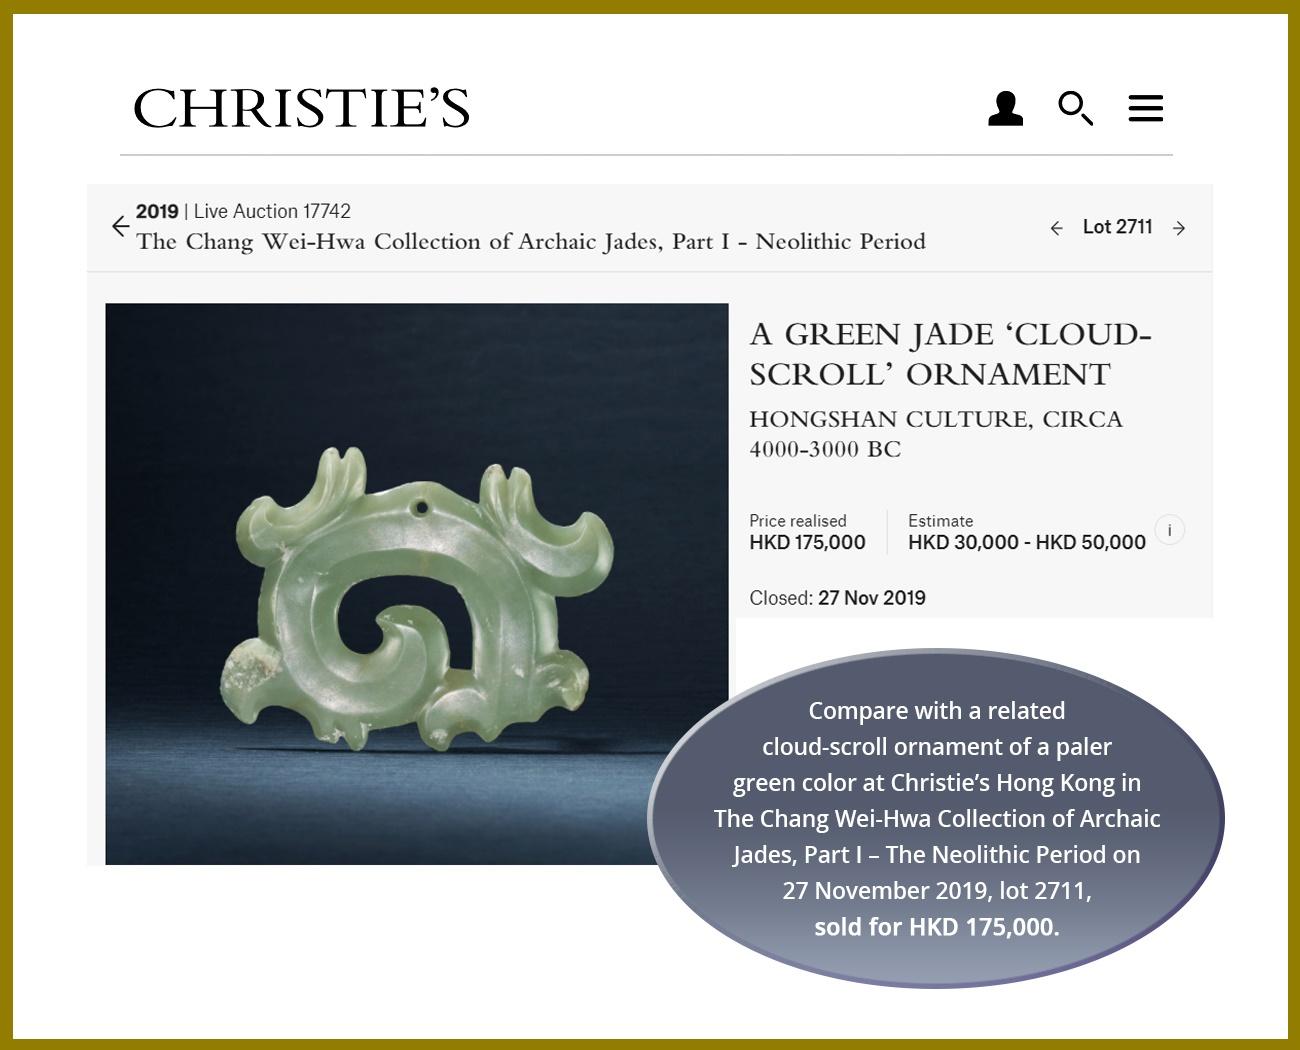 A DARK GREEN JADE OPENWORK 'CLOUD-SCROLL' PENDANT, GOUYUN, HONGSHAN CULTURE - Image 5 of 9